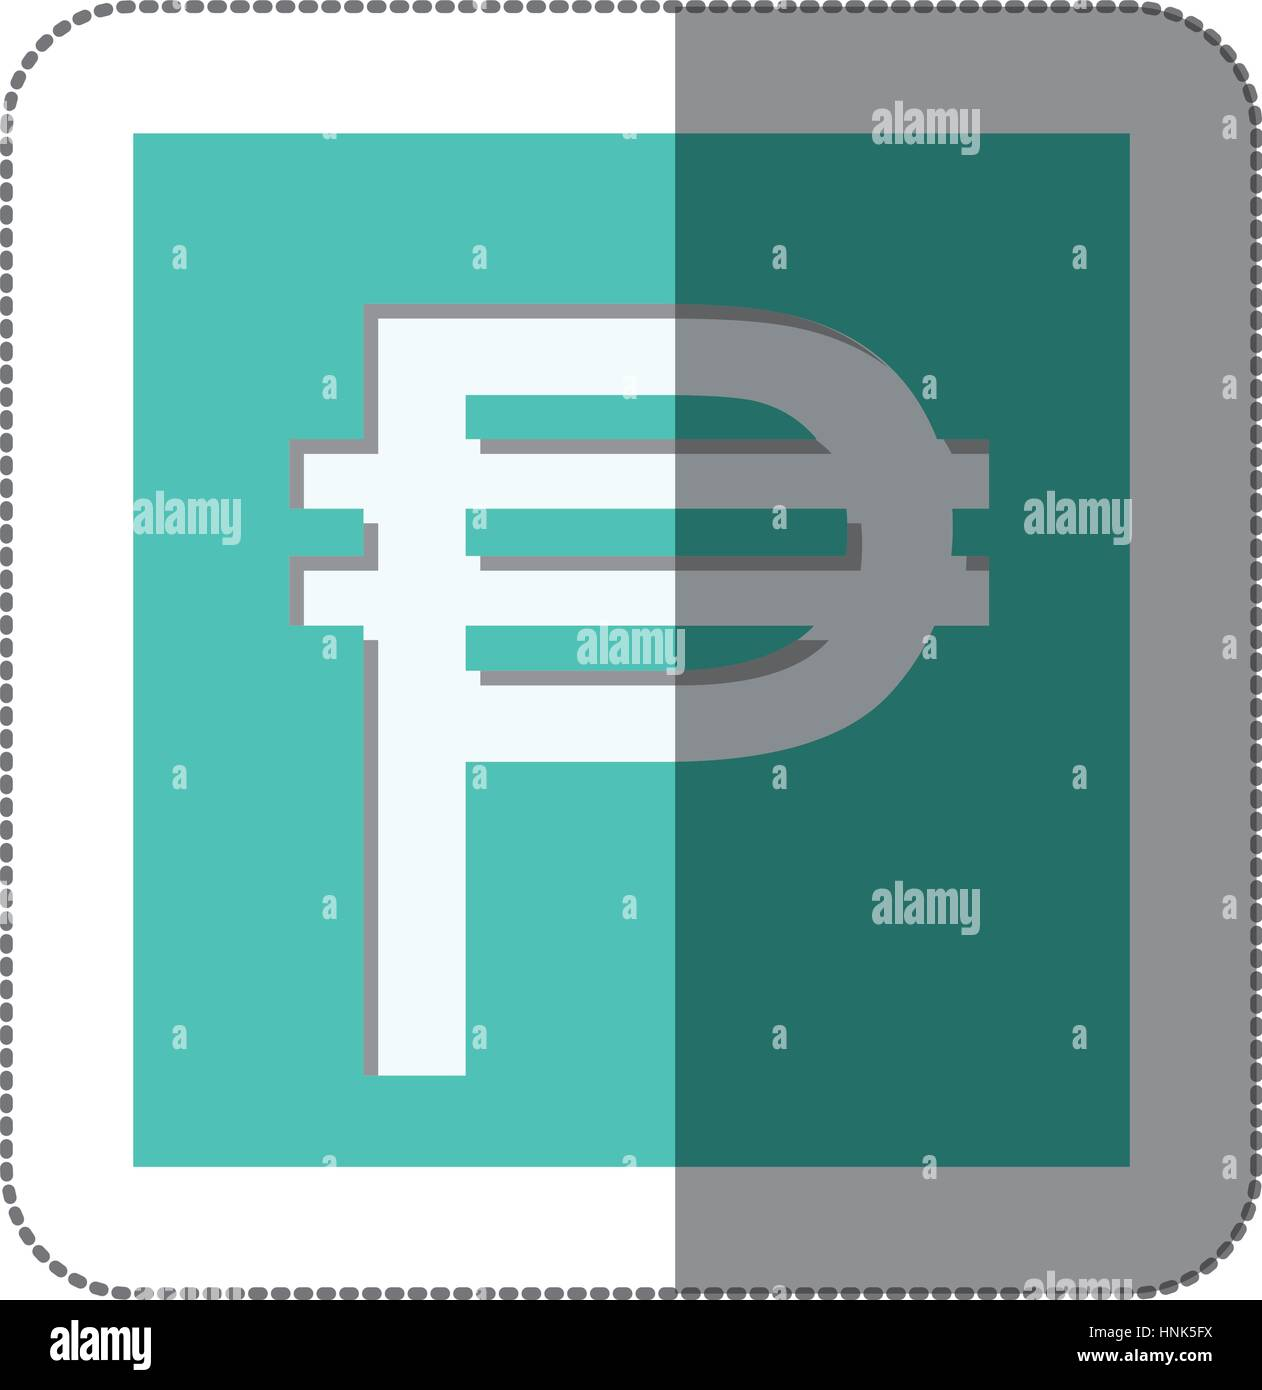 Pesos Currency Symbol Icon Image Vector Illustration Stock Vector